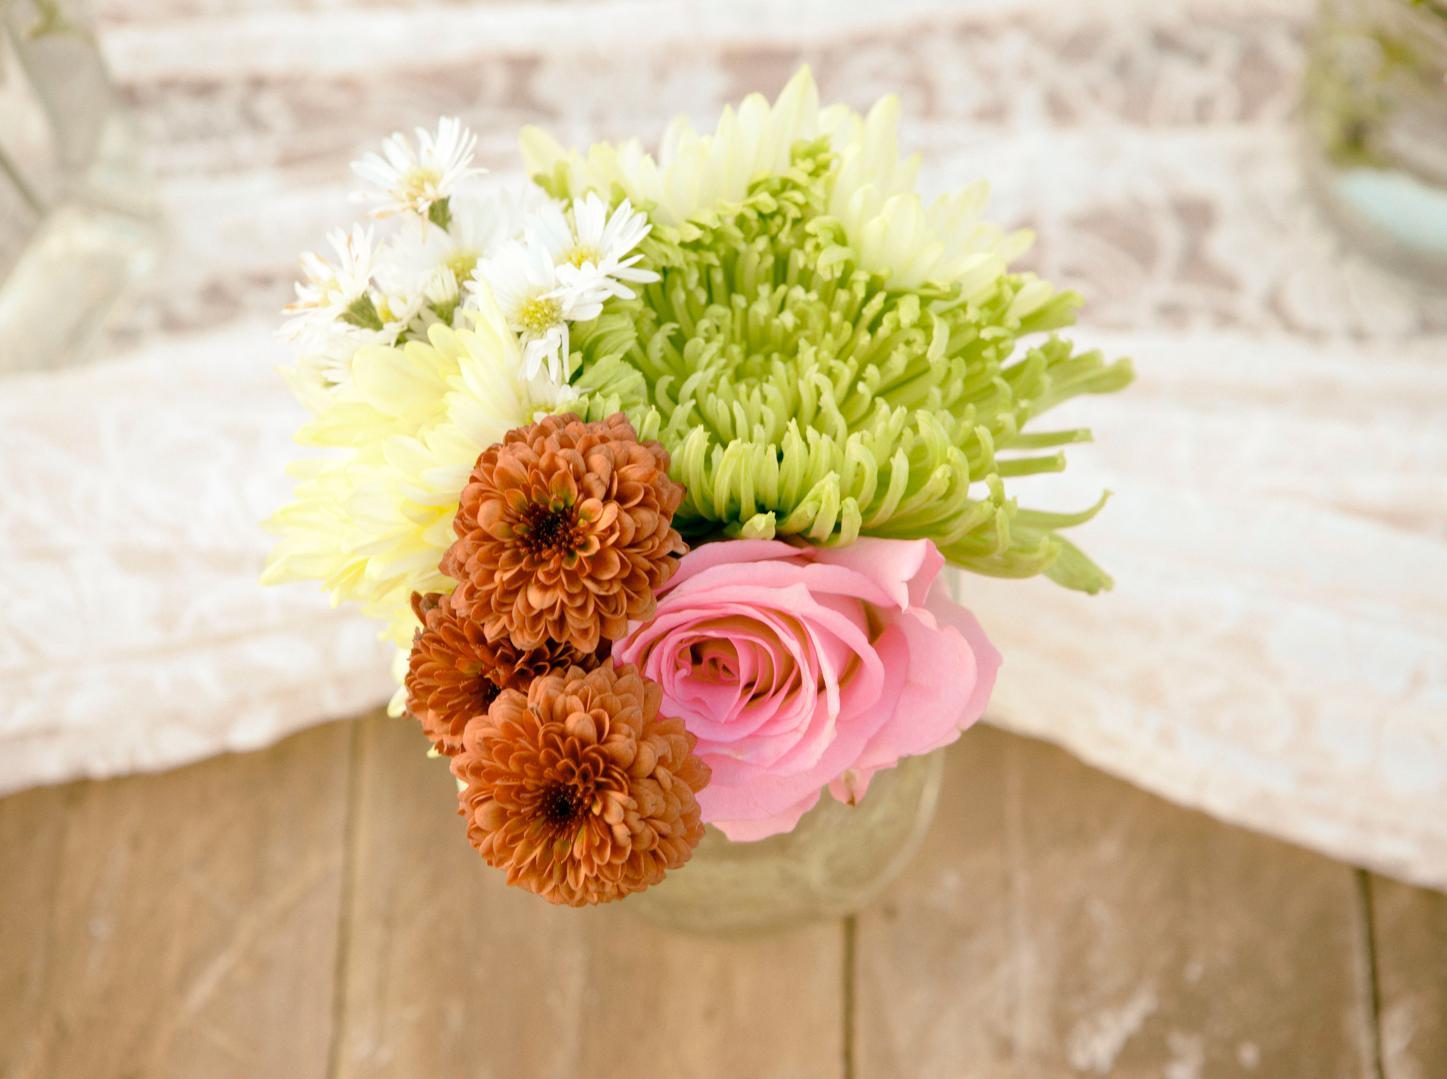 bodas-sin-clasificar-sin-tema-cuba-42032.jpg